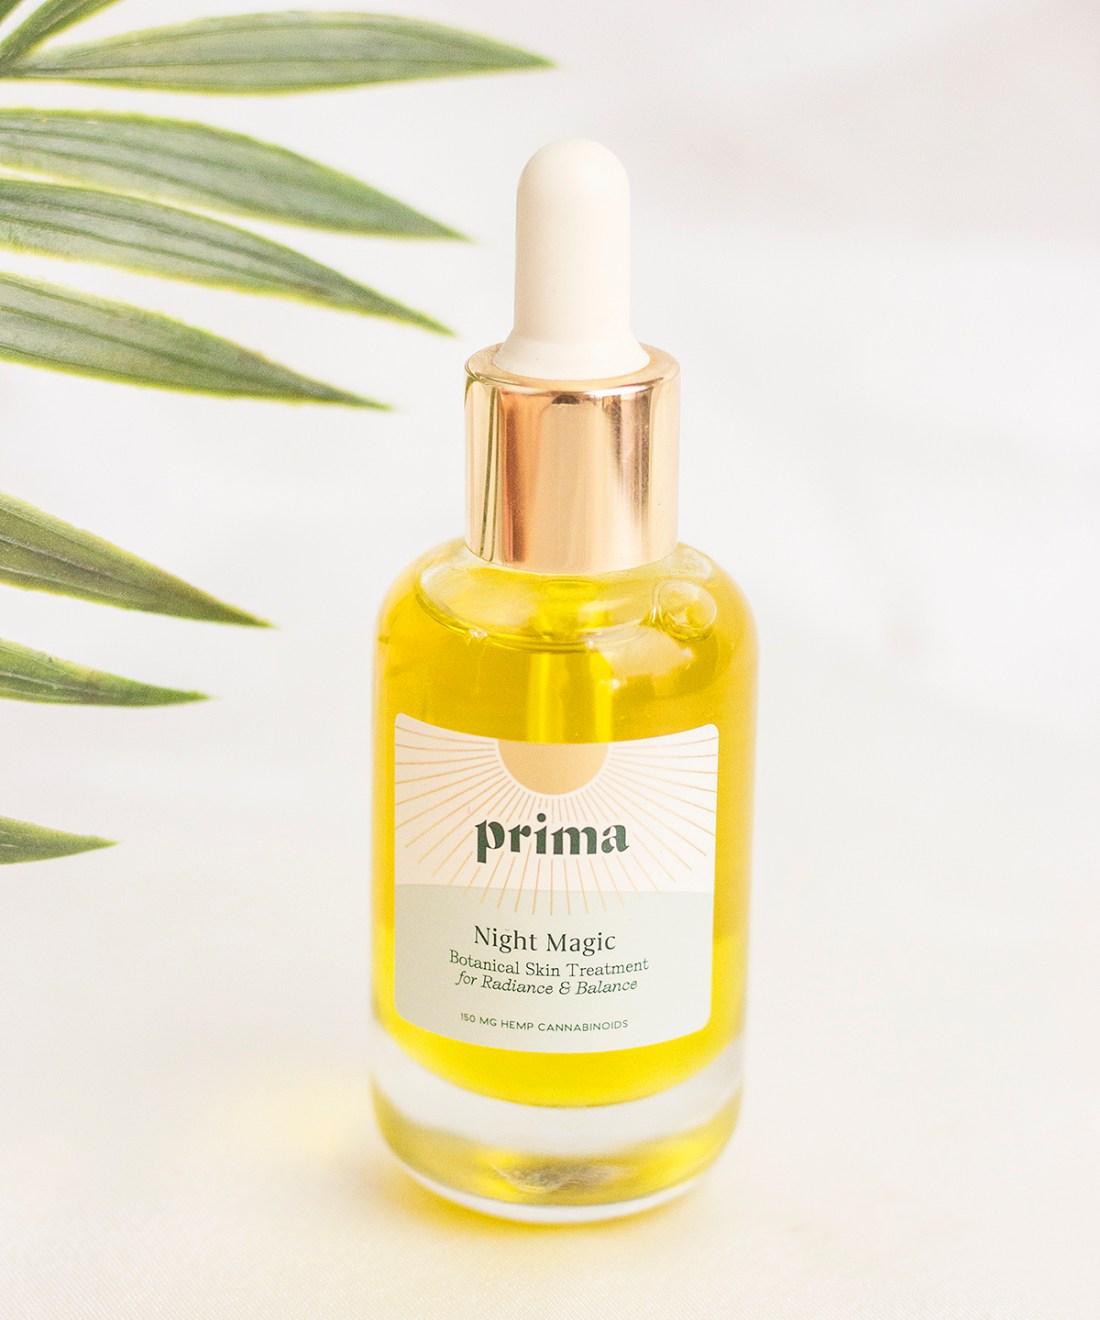 Prima Night Magic CBD Facial Oil | A Good Hue